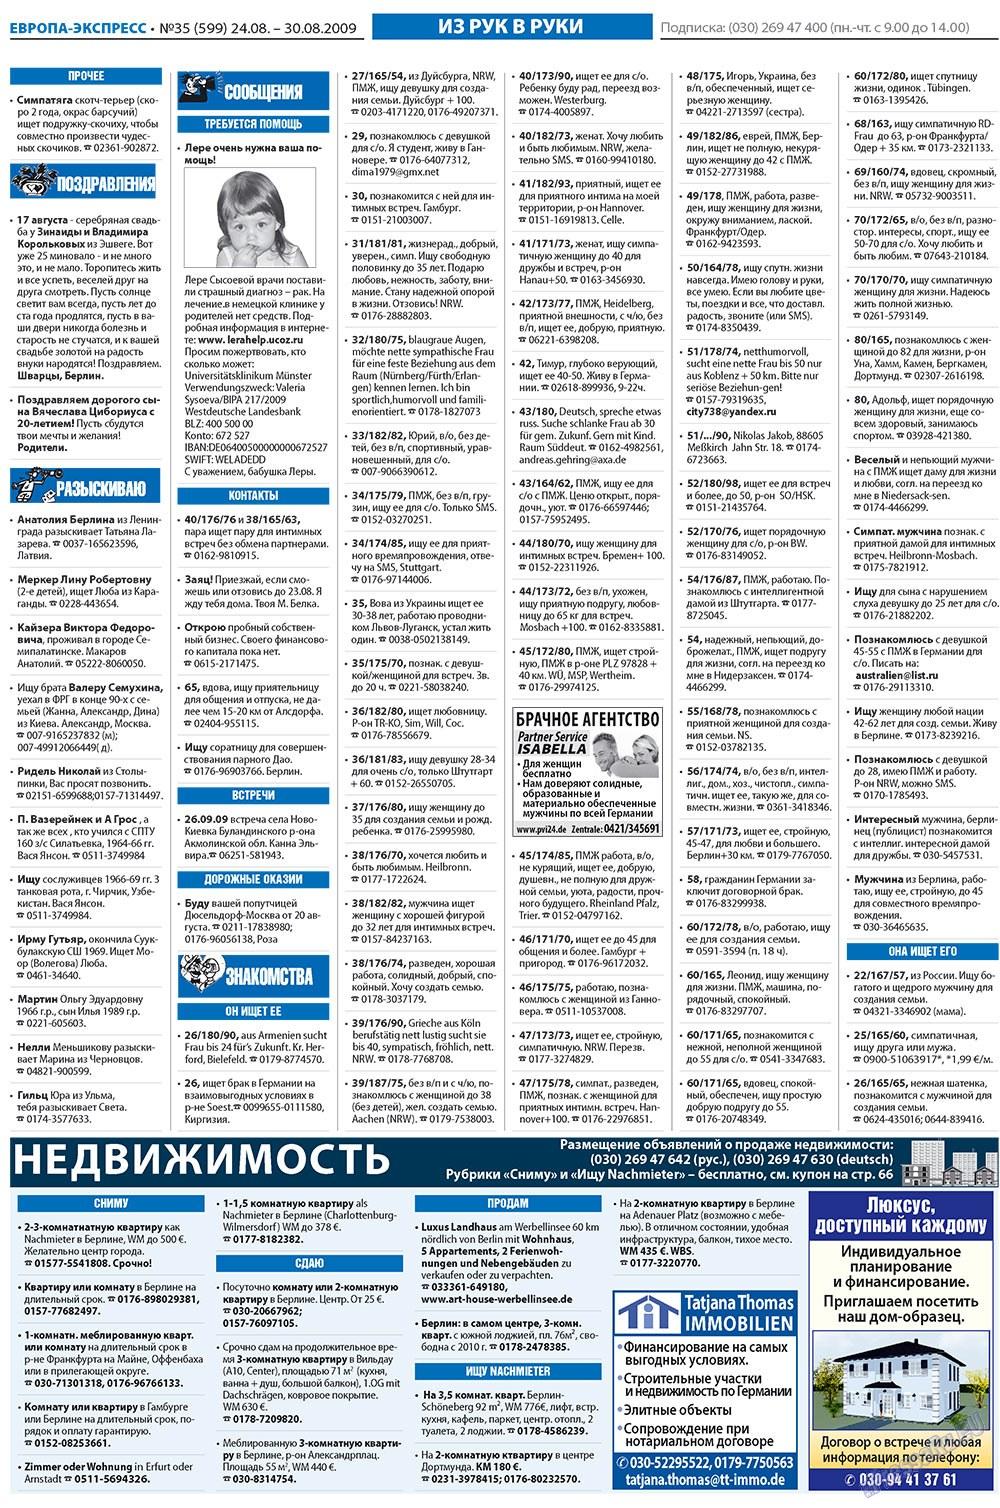 Европа экспресс (газета). 2009 год, номер 35, стр. 20